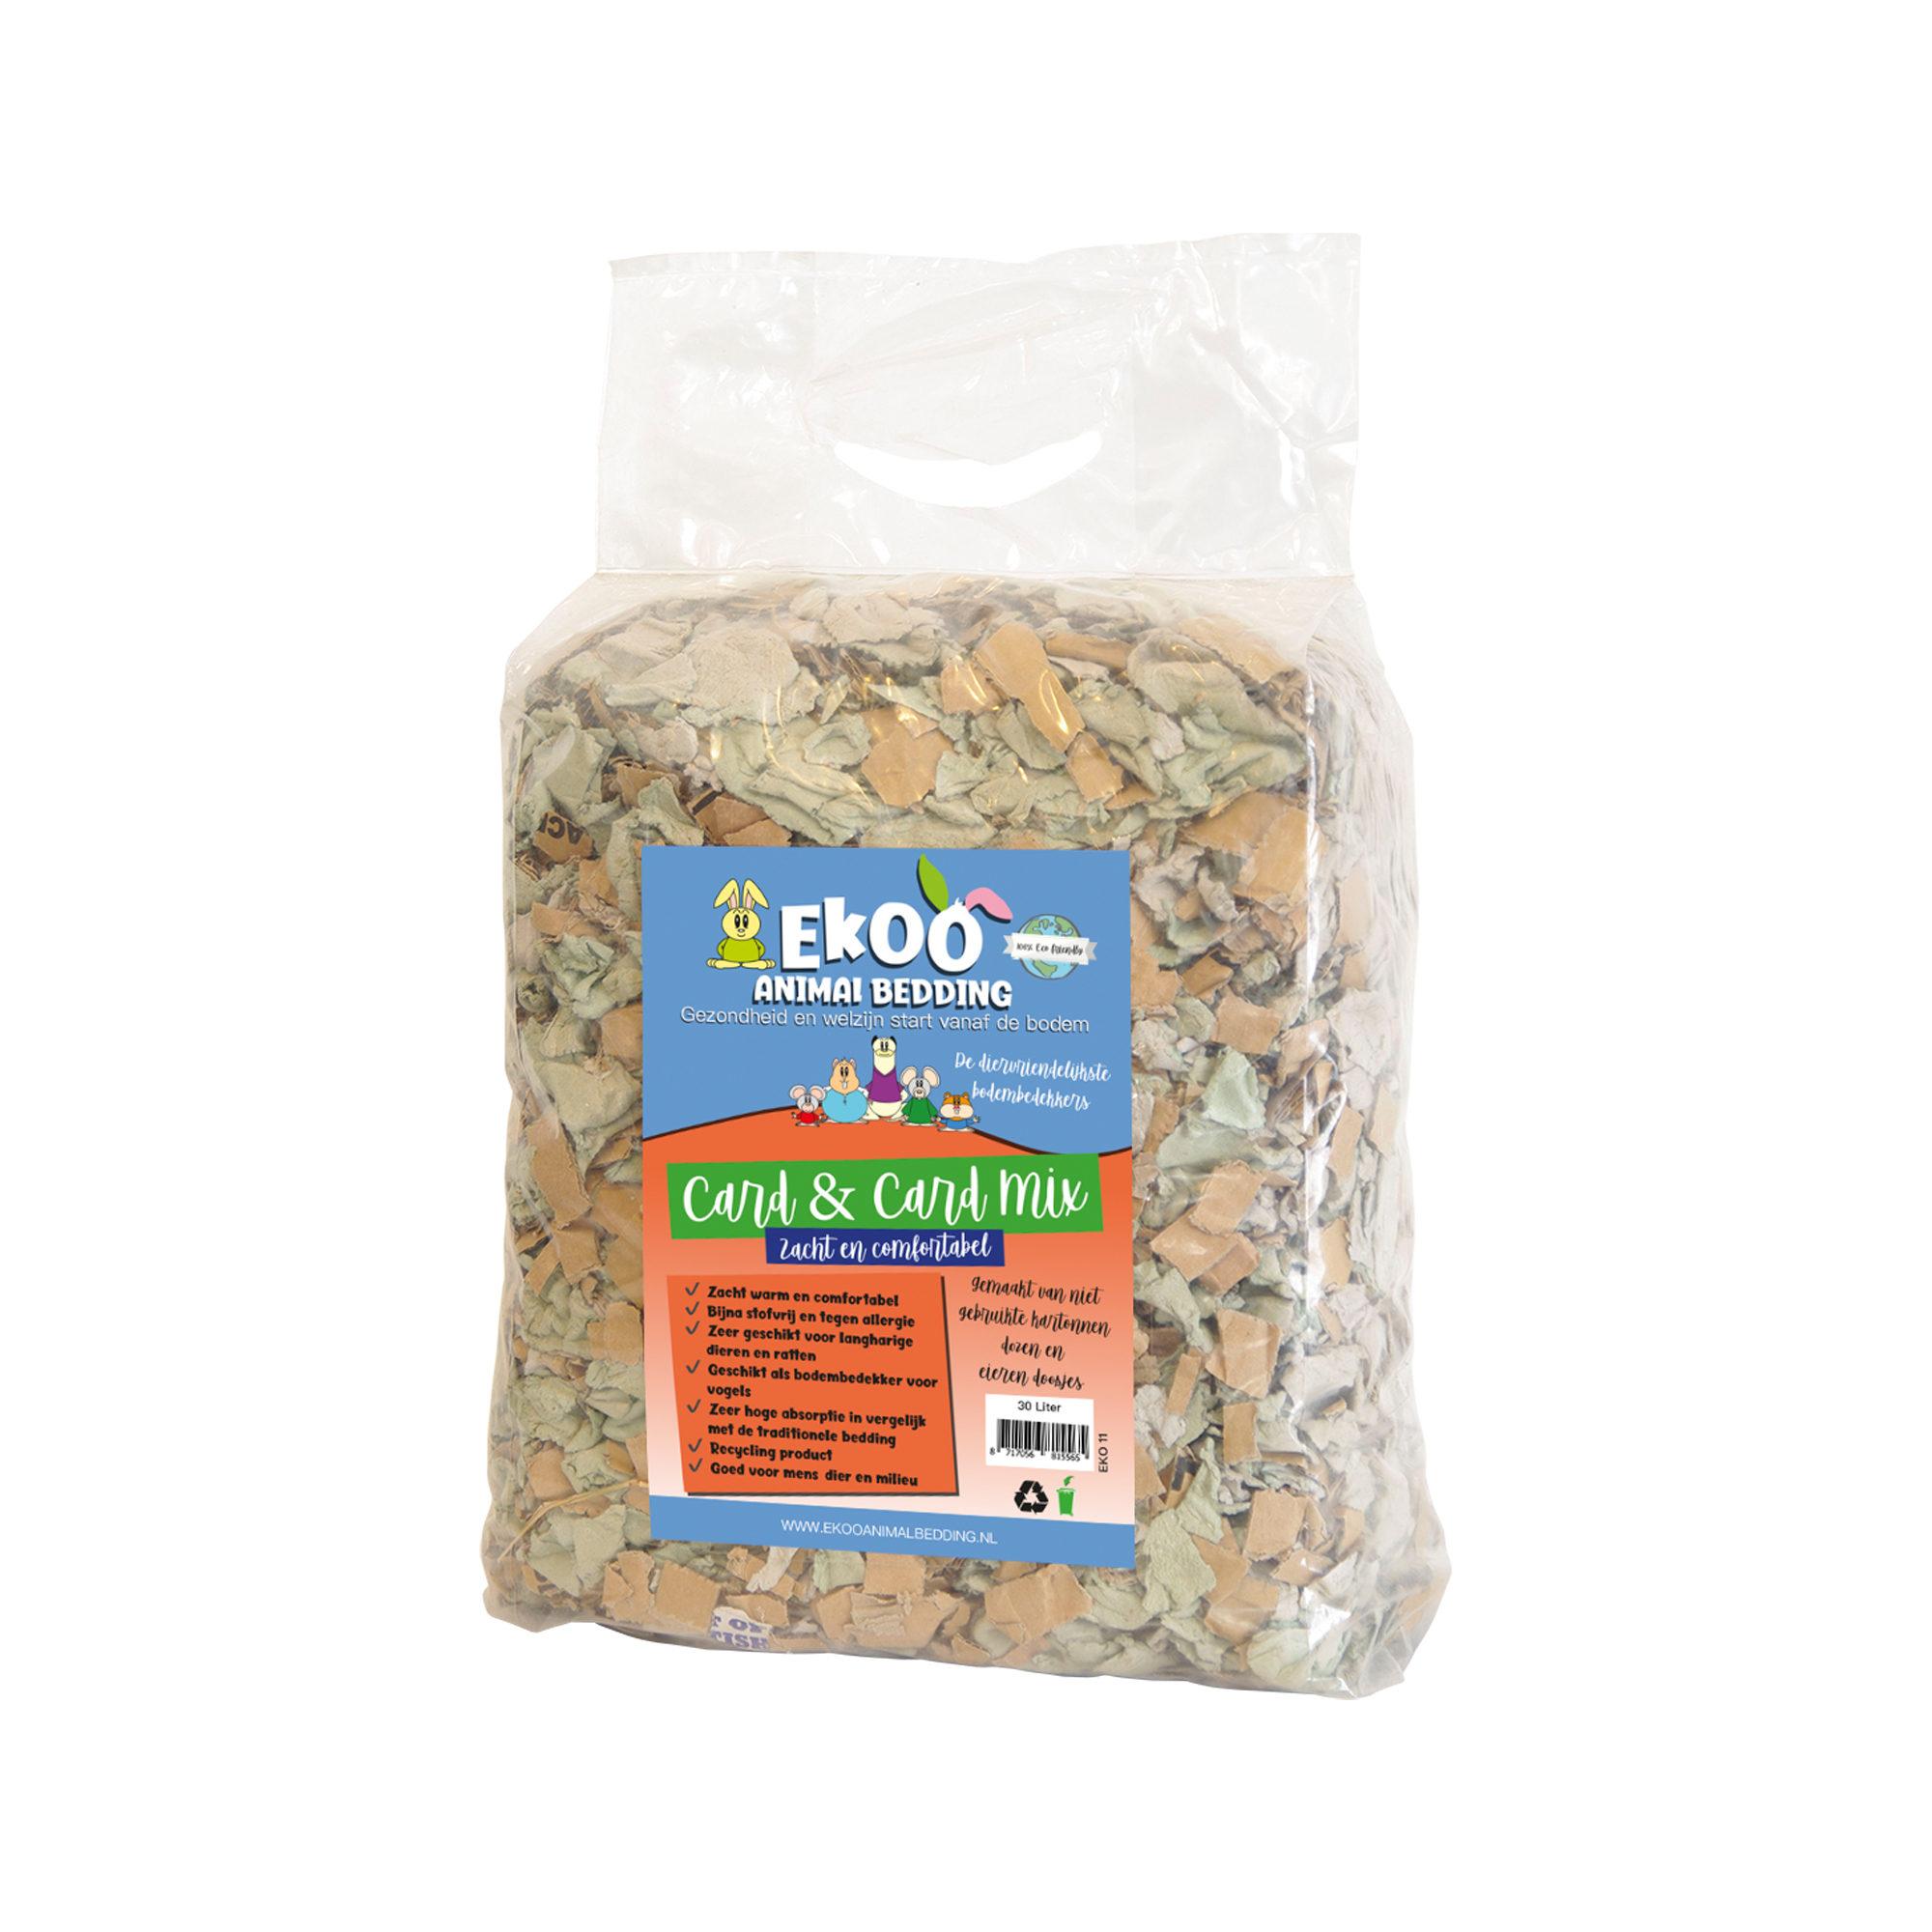 Ekoo Animal Bedding Card & Card Mix